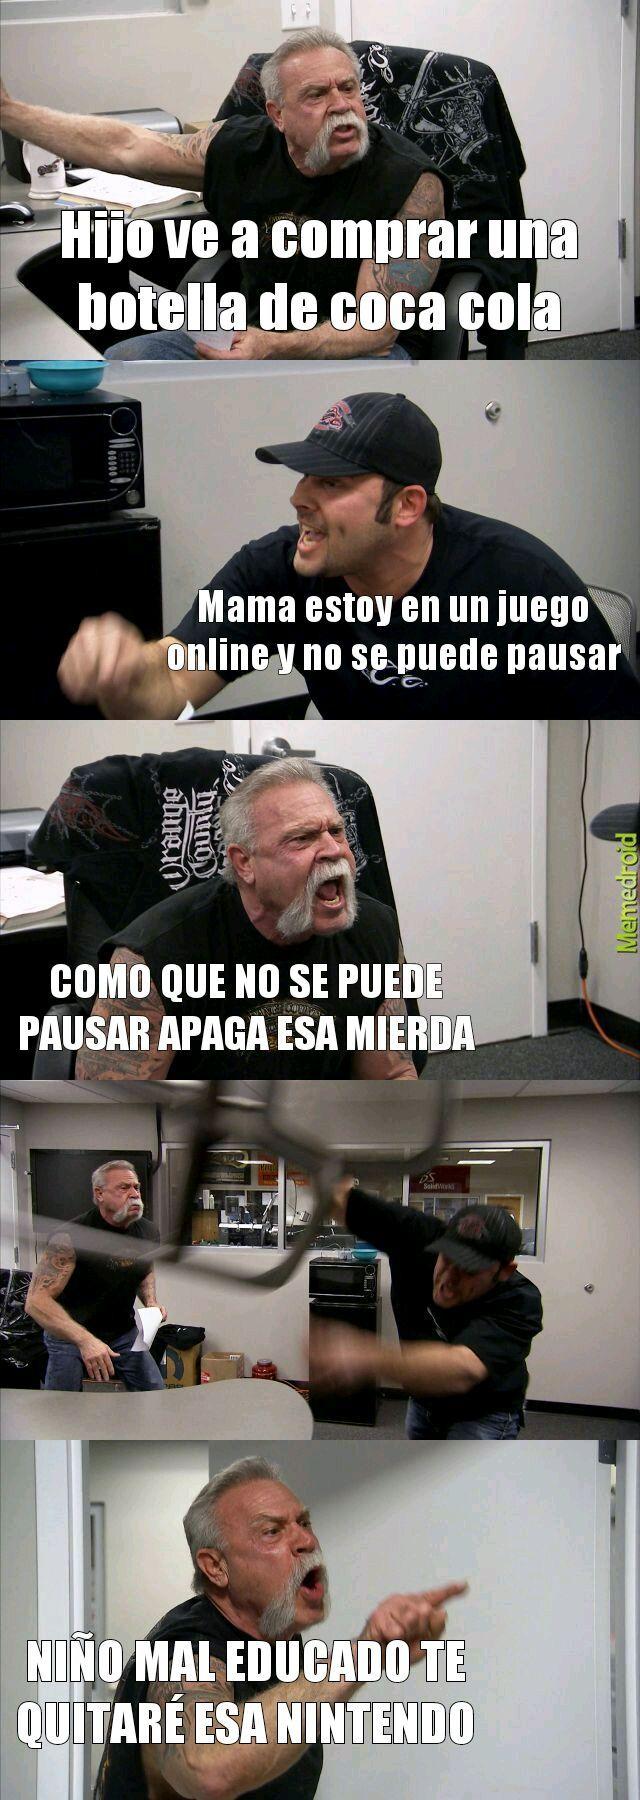 Buenisimo - meme